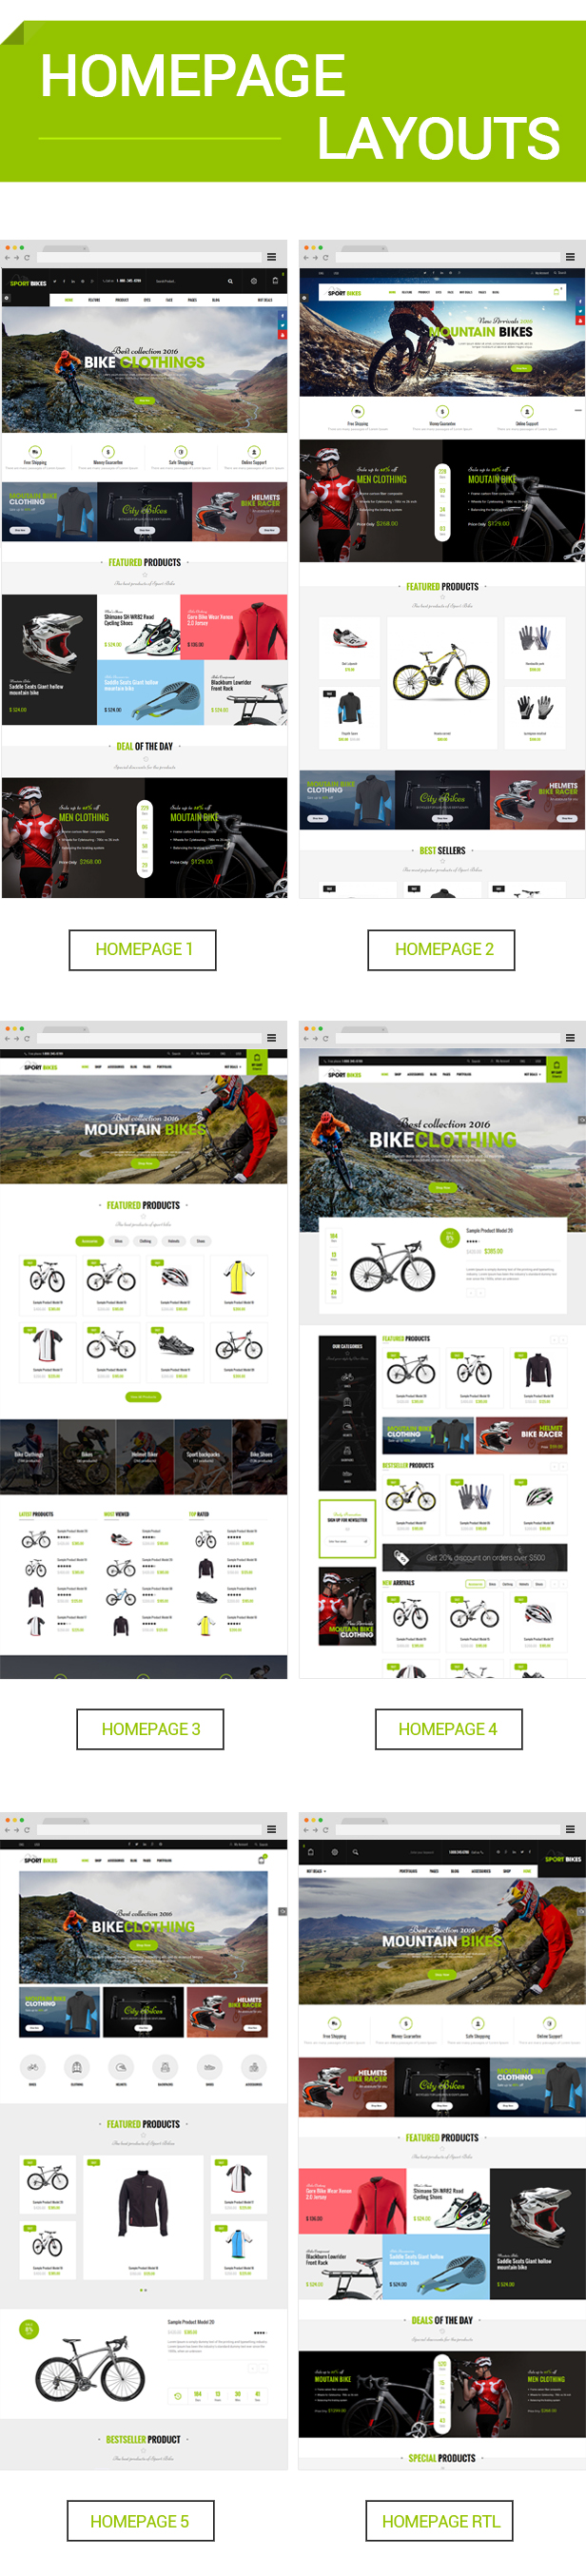 Sportbike-WordPress-Layout